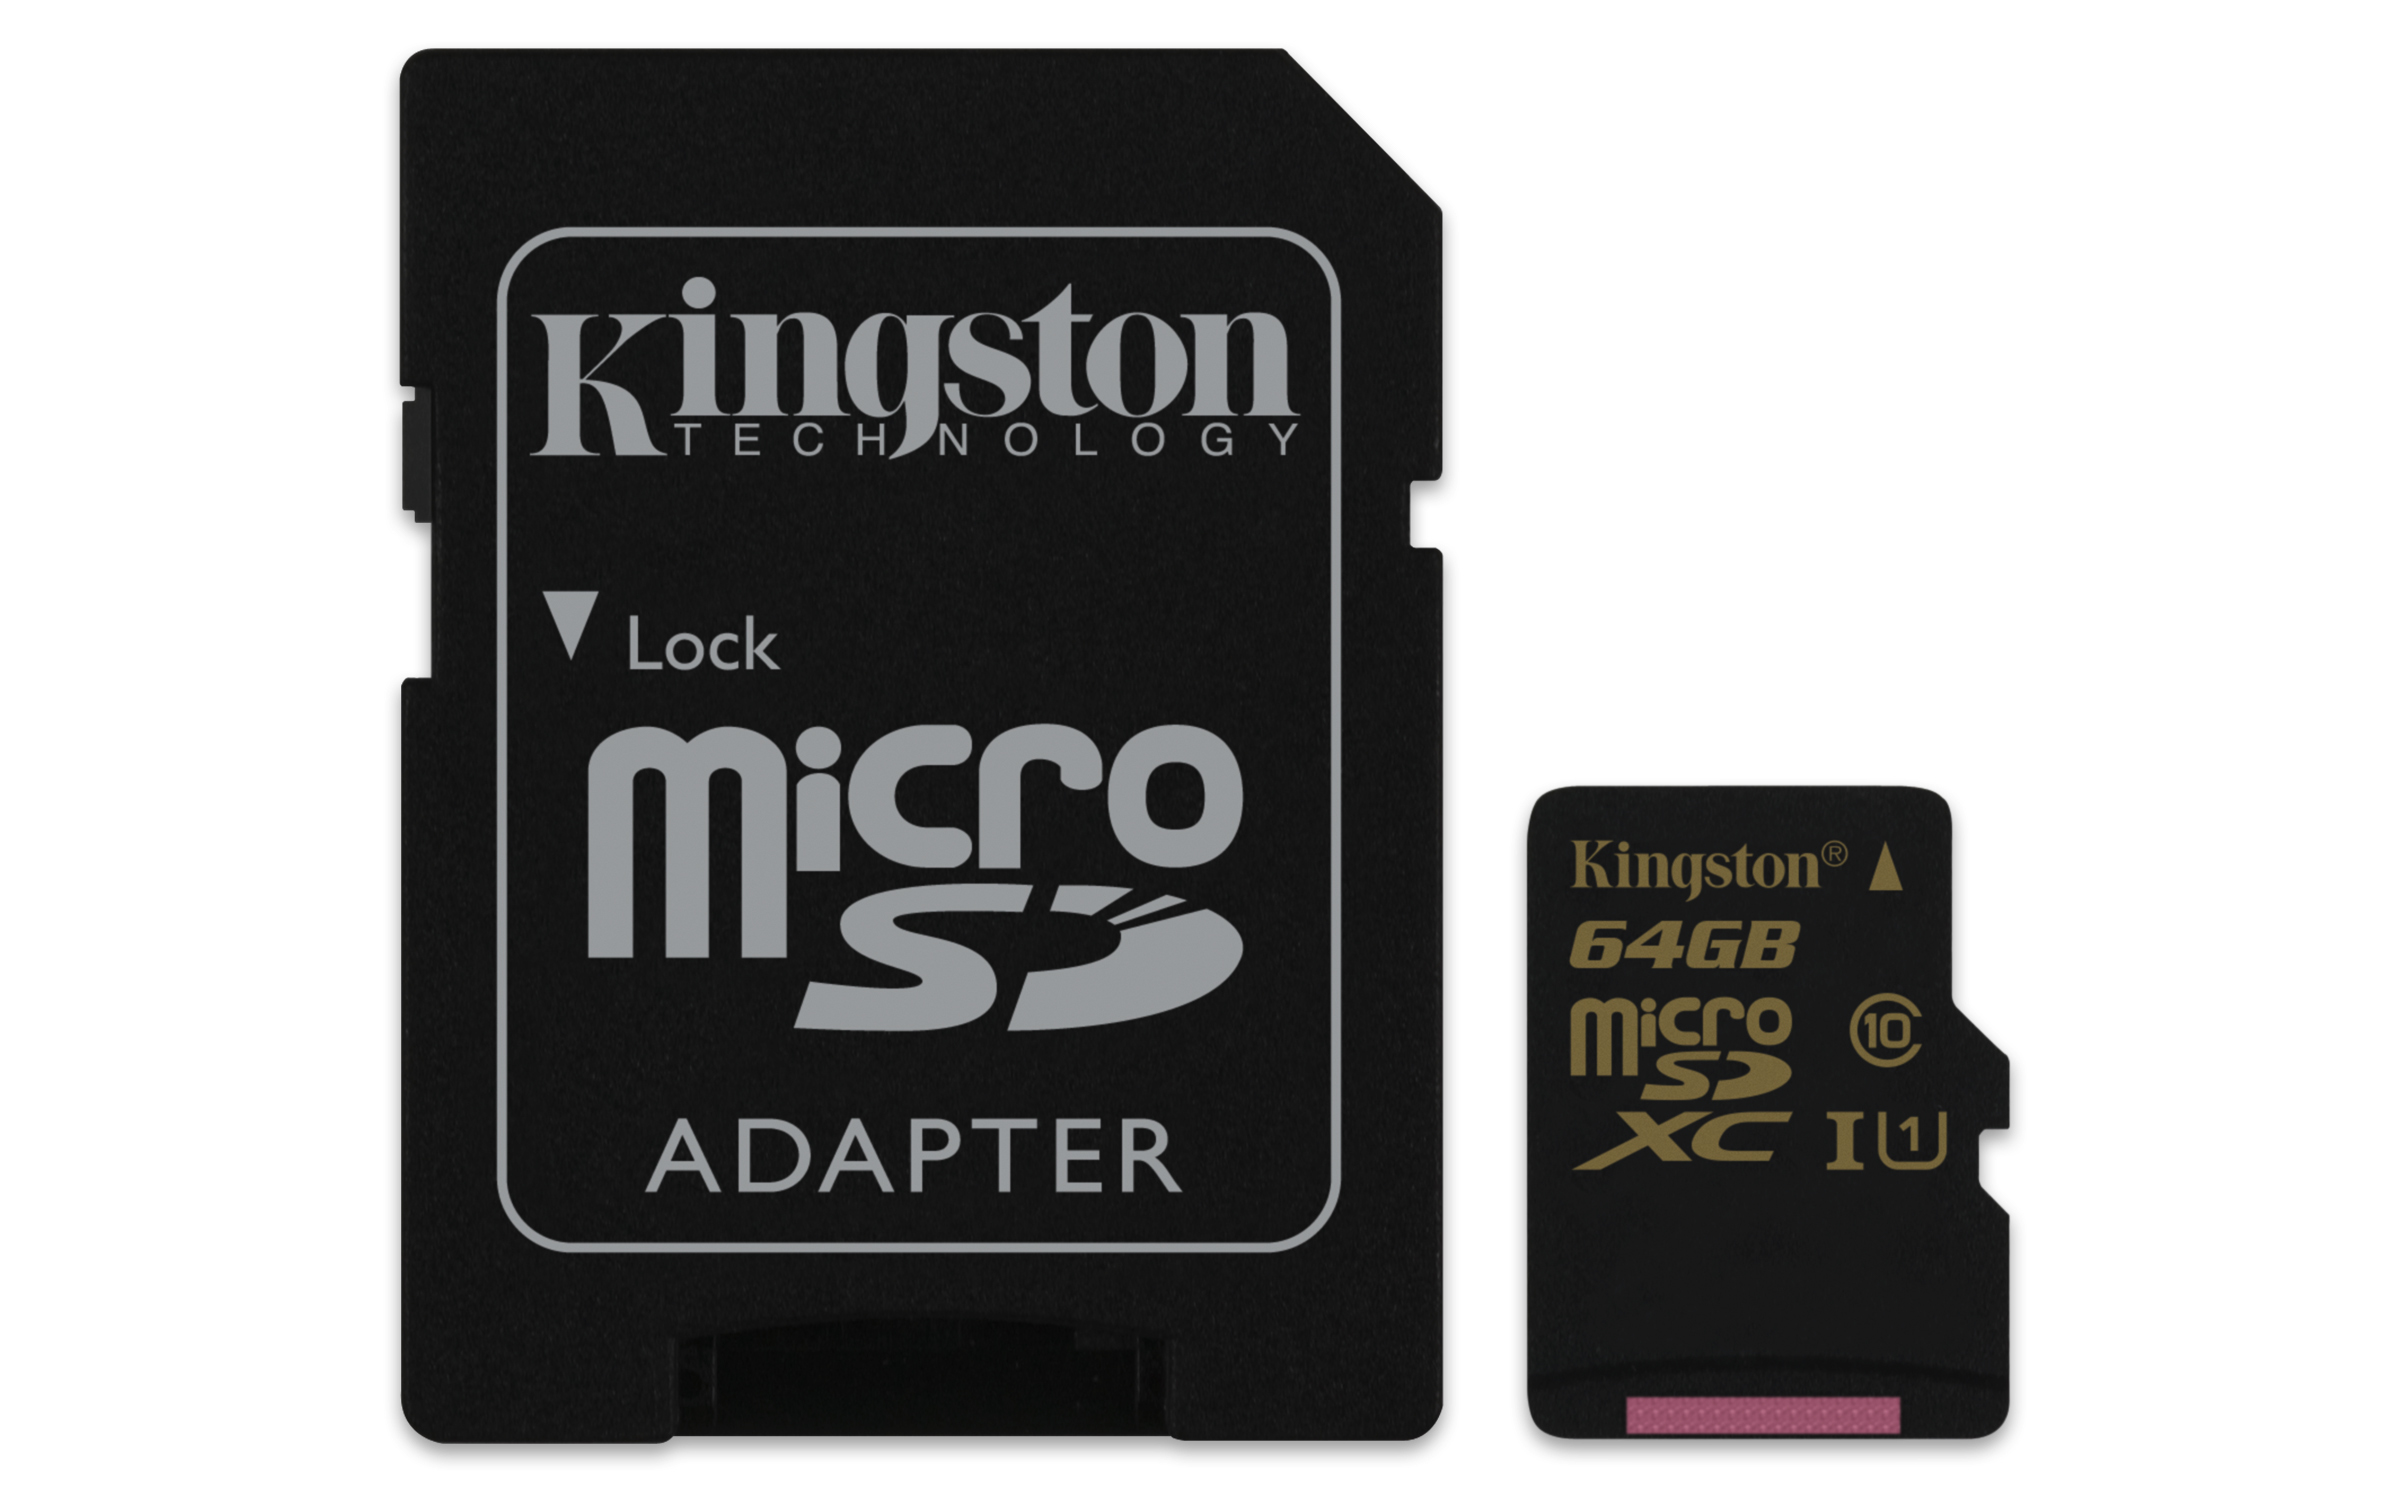 Kingston Technology microSDHC/SDXC Class 10 UHS-I 64GB 64GB MicroSDXC UHS Class 10 memory card